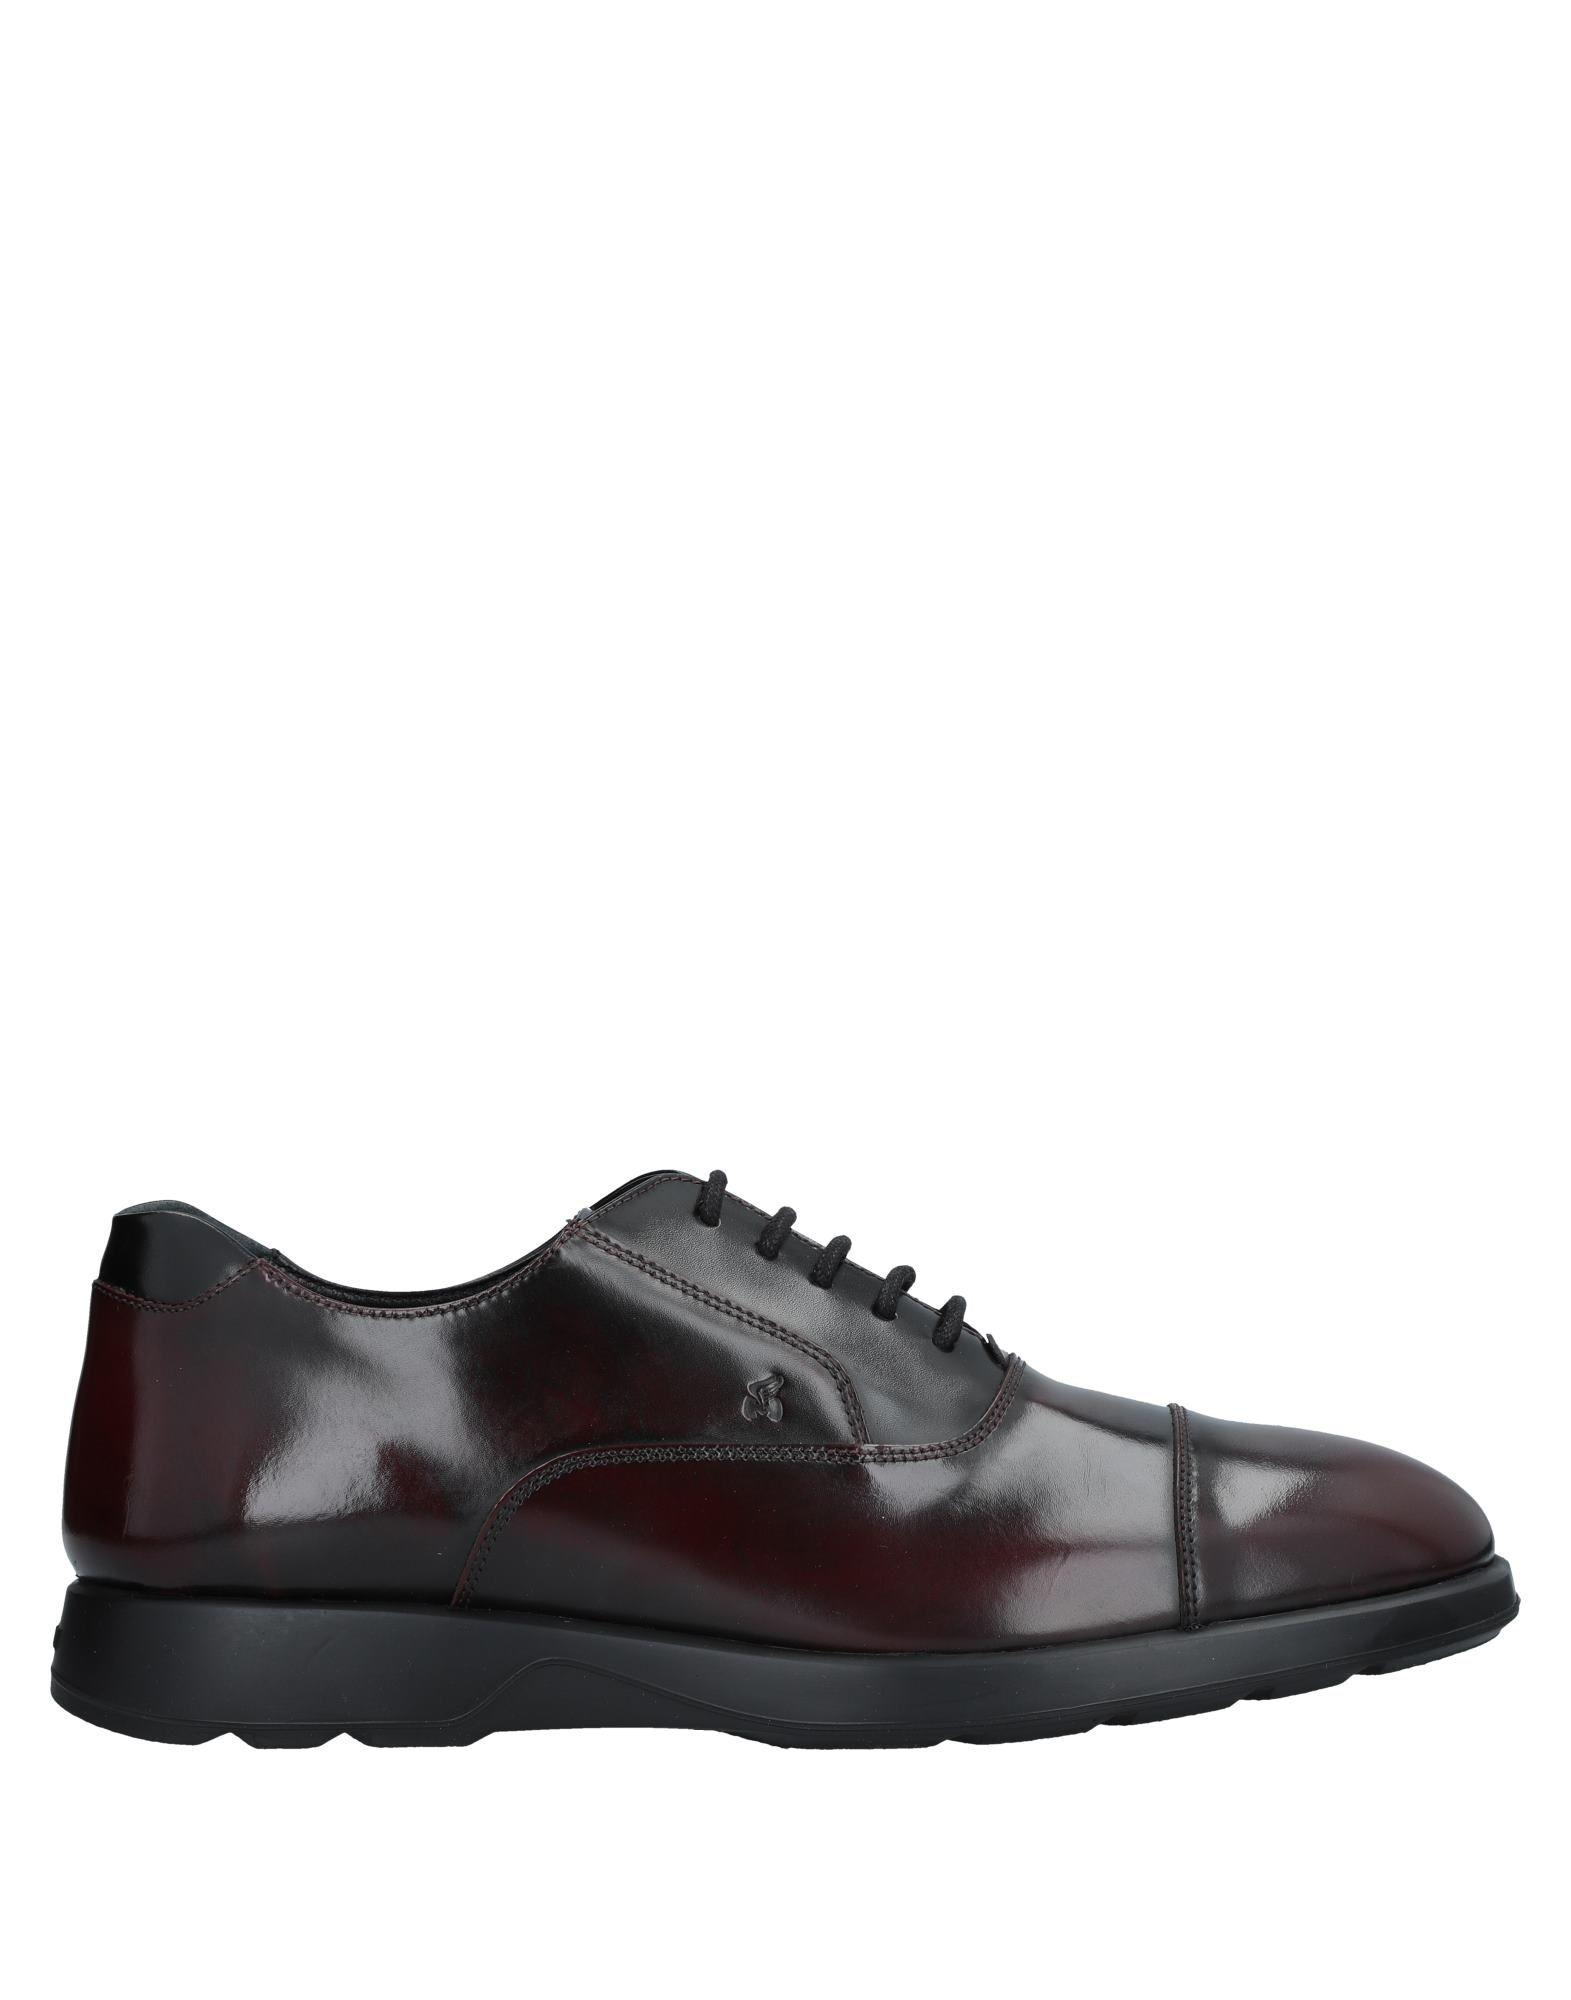 Hogan Schnürschuhe Herren  11536890XU Gute Qualität beliebte Schuhe